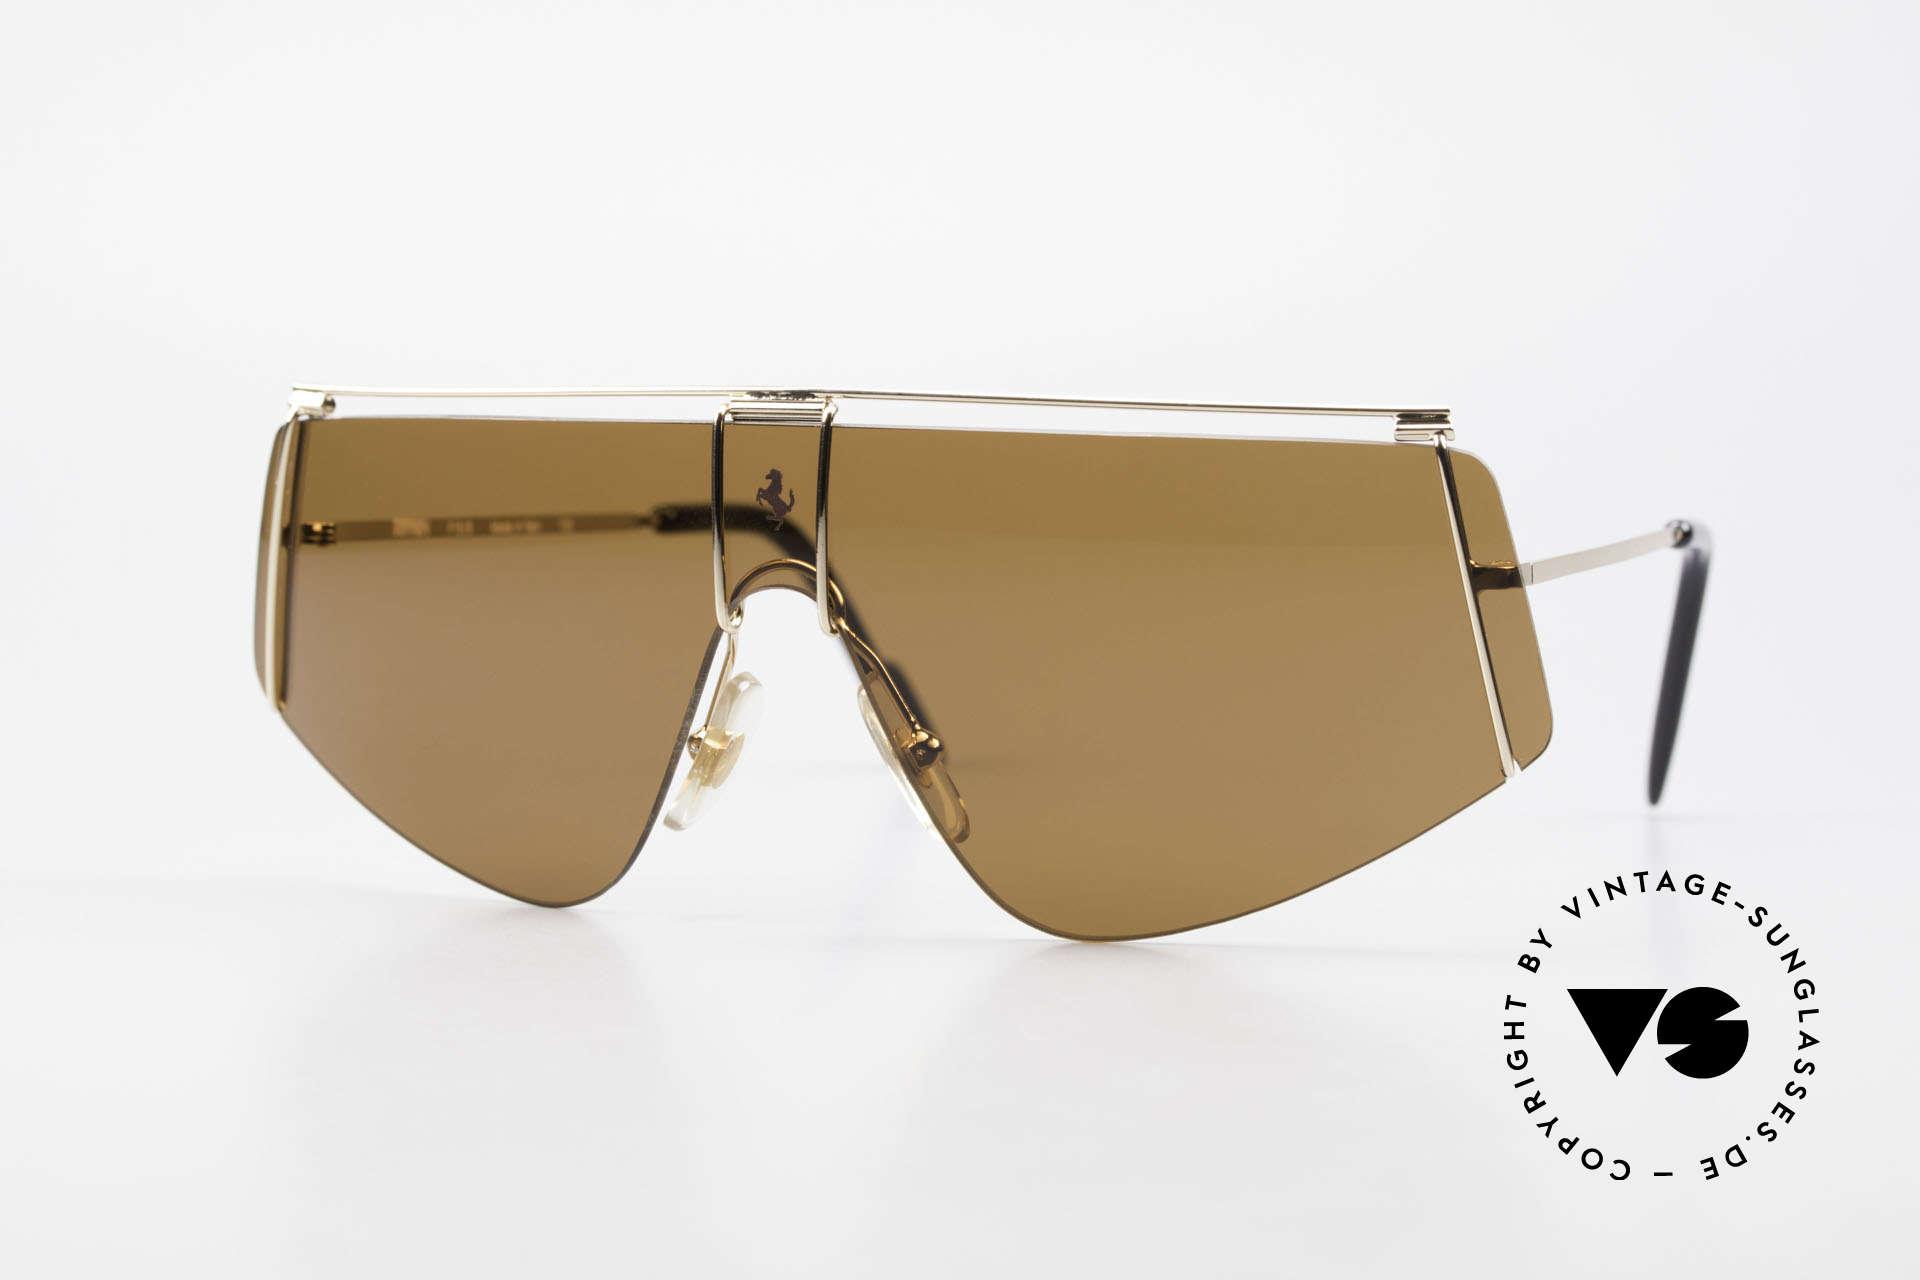 Ferrari F15/S Luxury Sports Sunglasses 90's, sporty 90's luxury sunglasses by famous Ferrari, Made for Men and Women